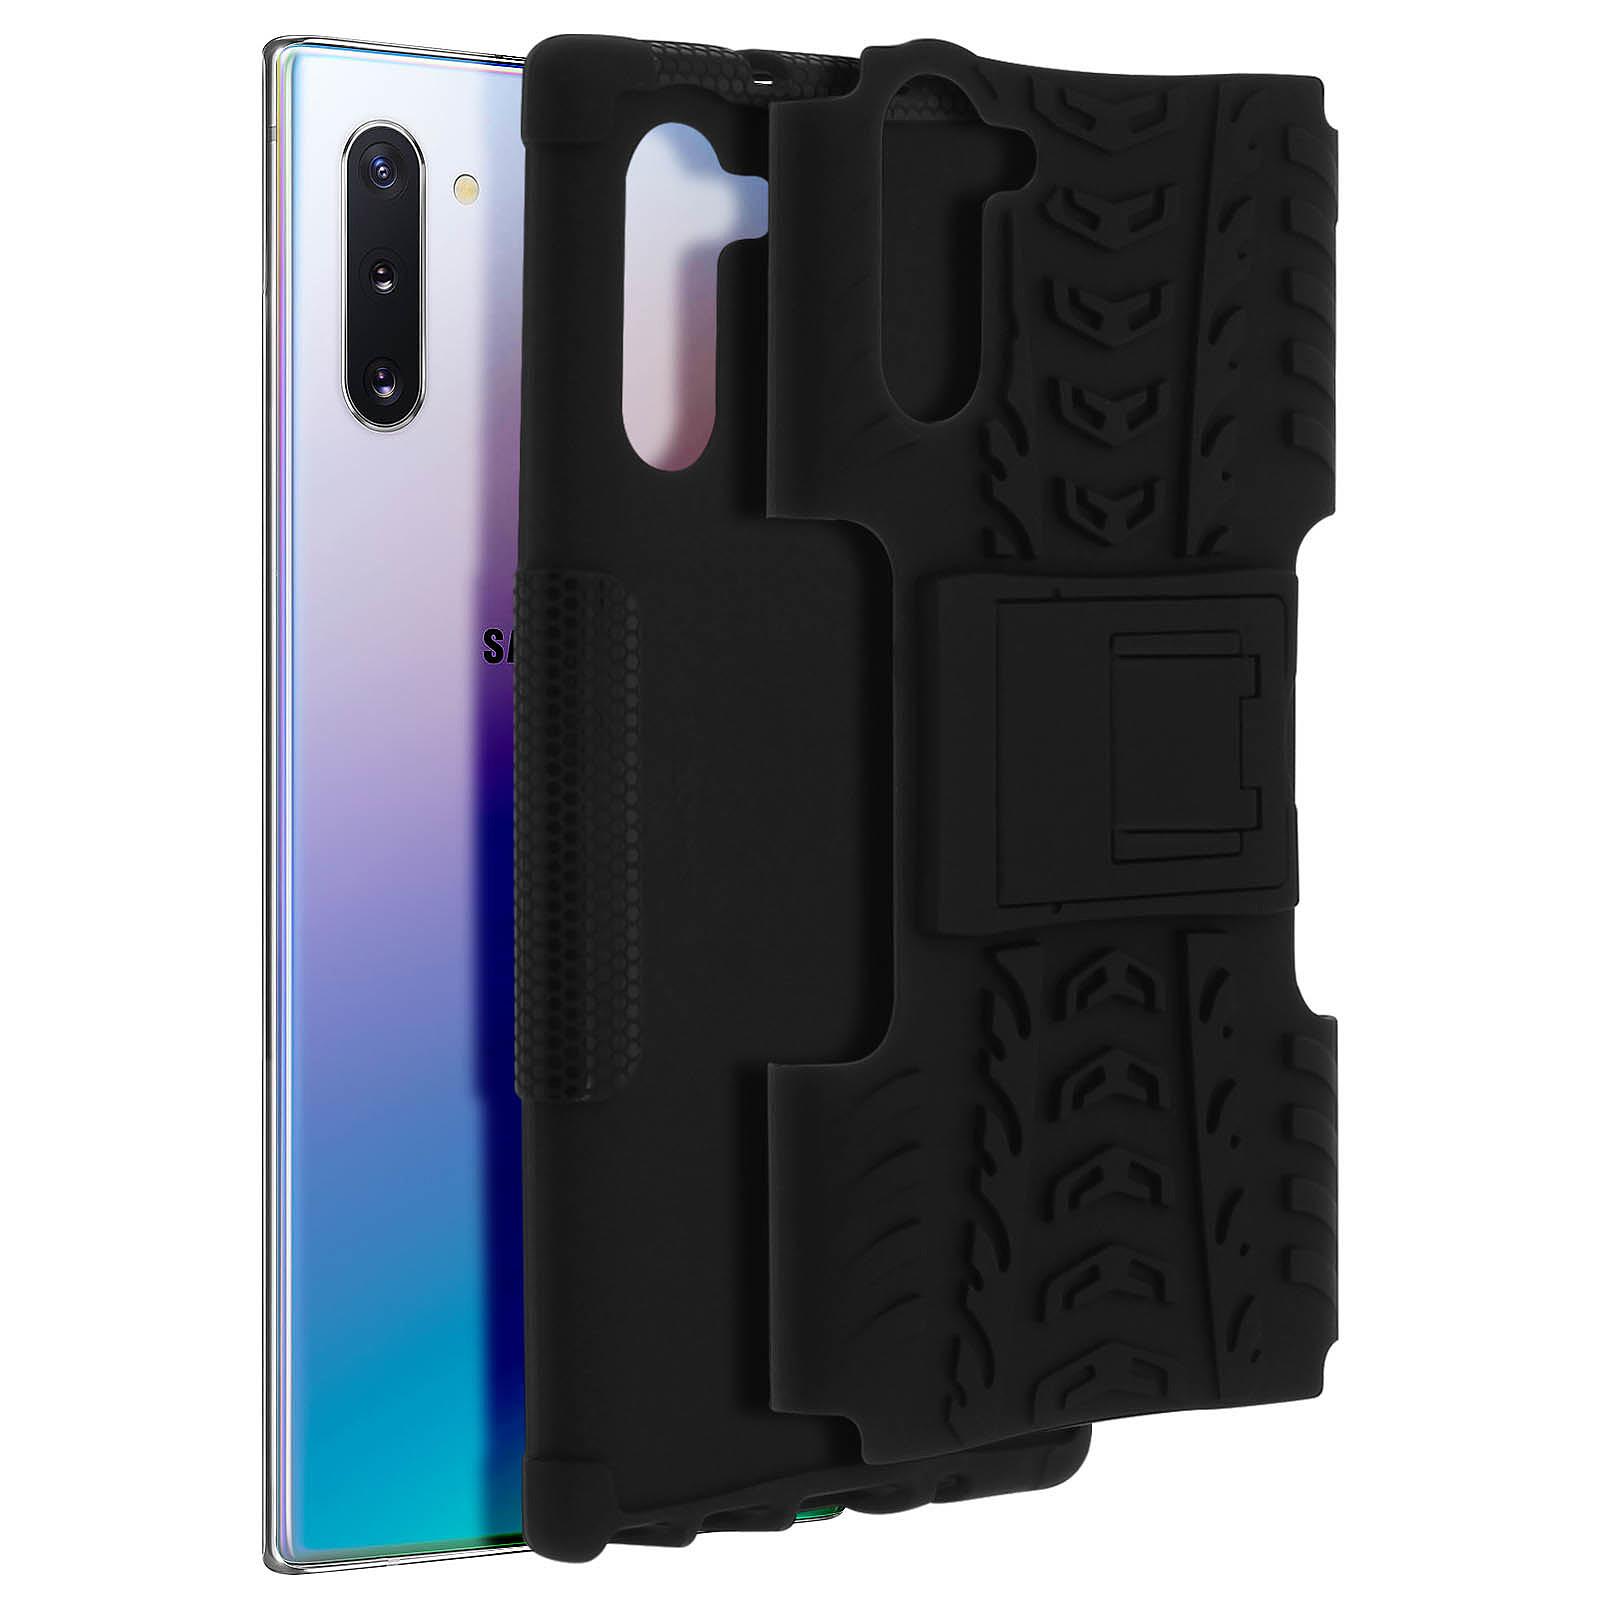 Avizar Coque Noir Bi-matières pour Samsung Galaxy Note 10